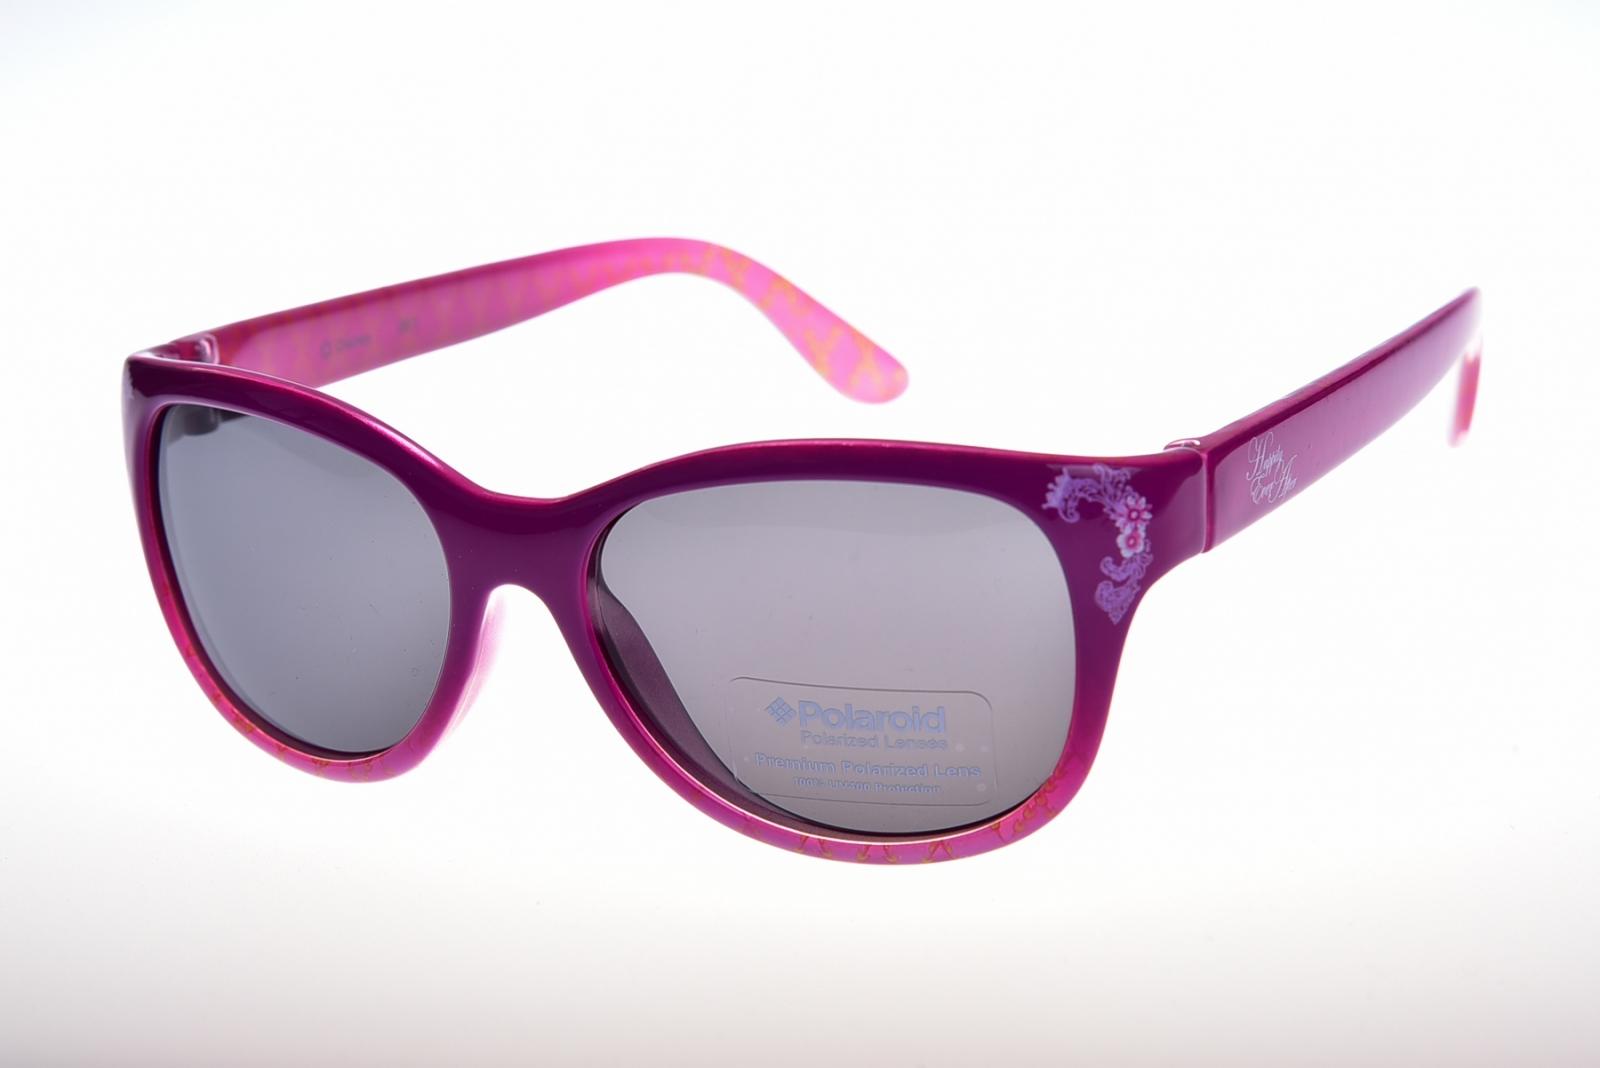 Polaroid Disney D0206C - Slnečné okuliare pre deti 8-12 r.